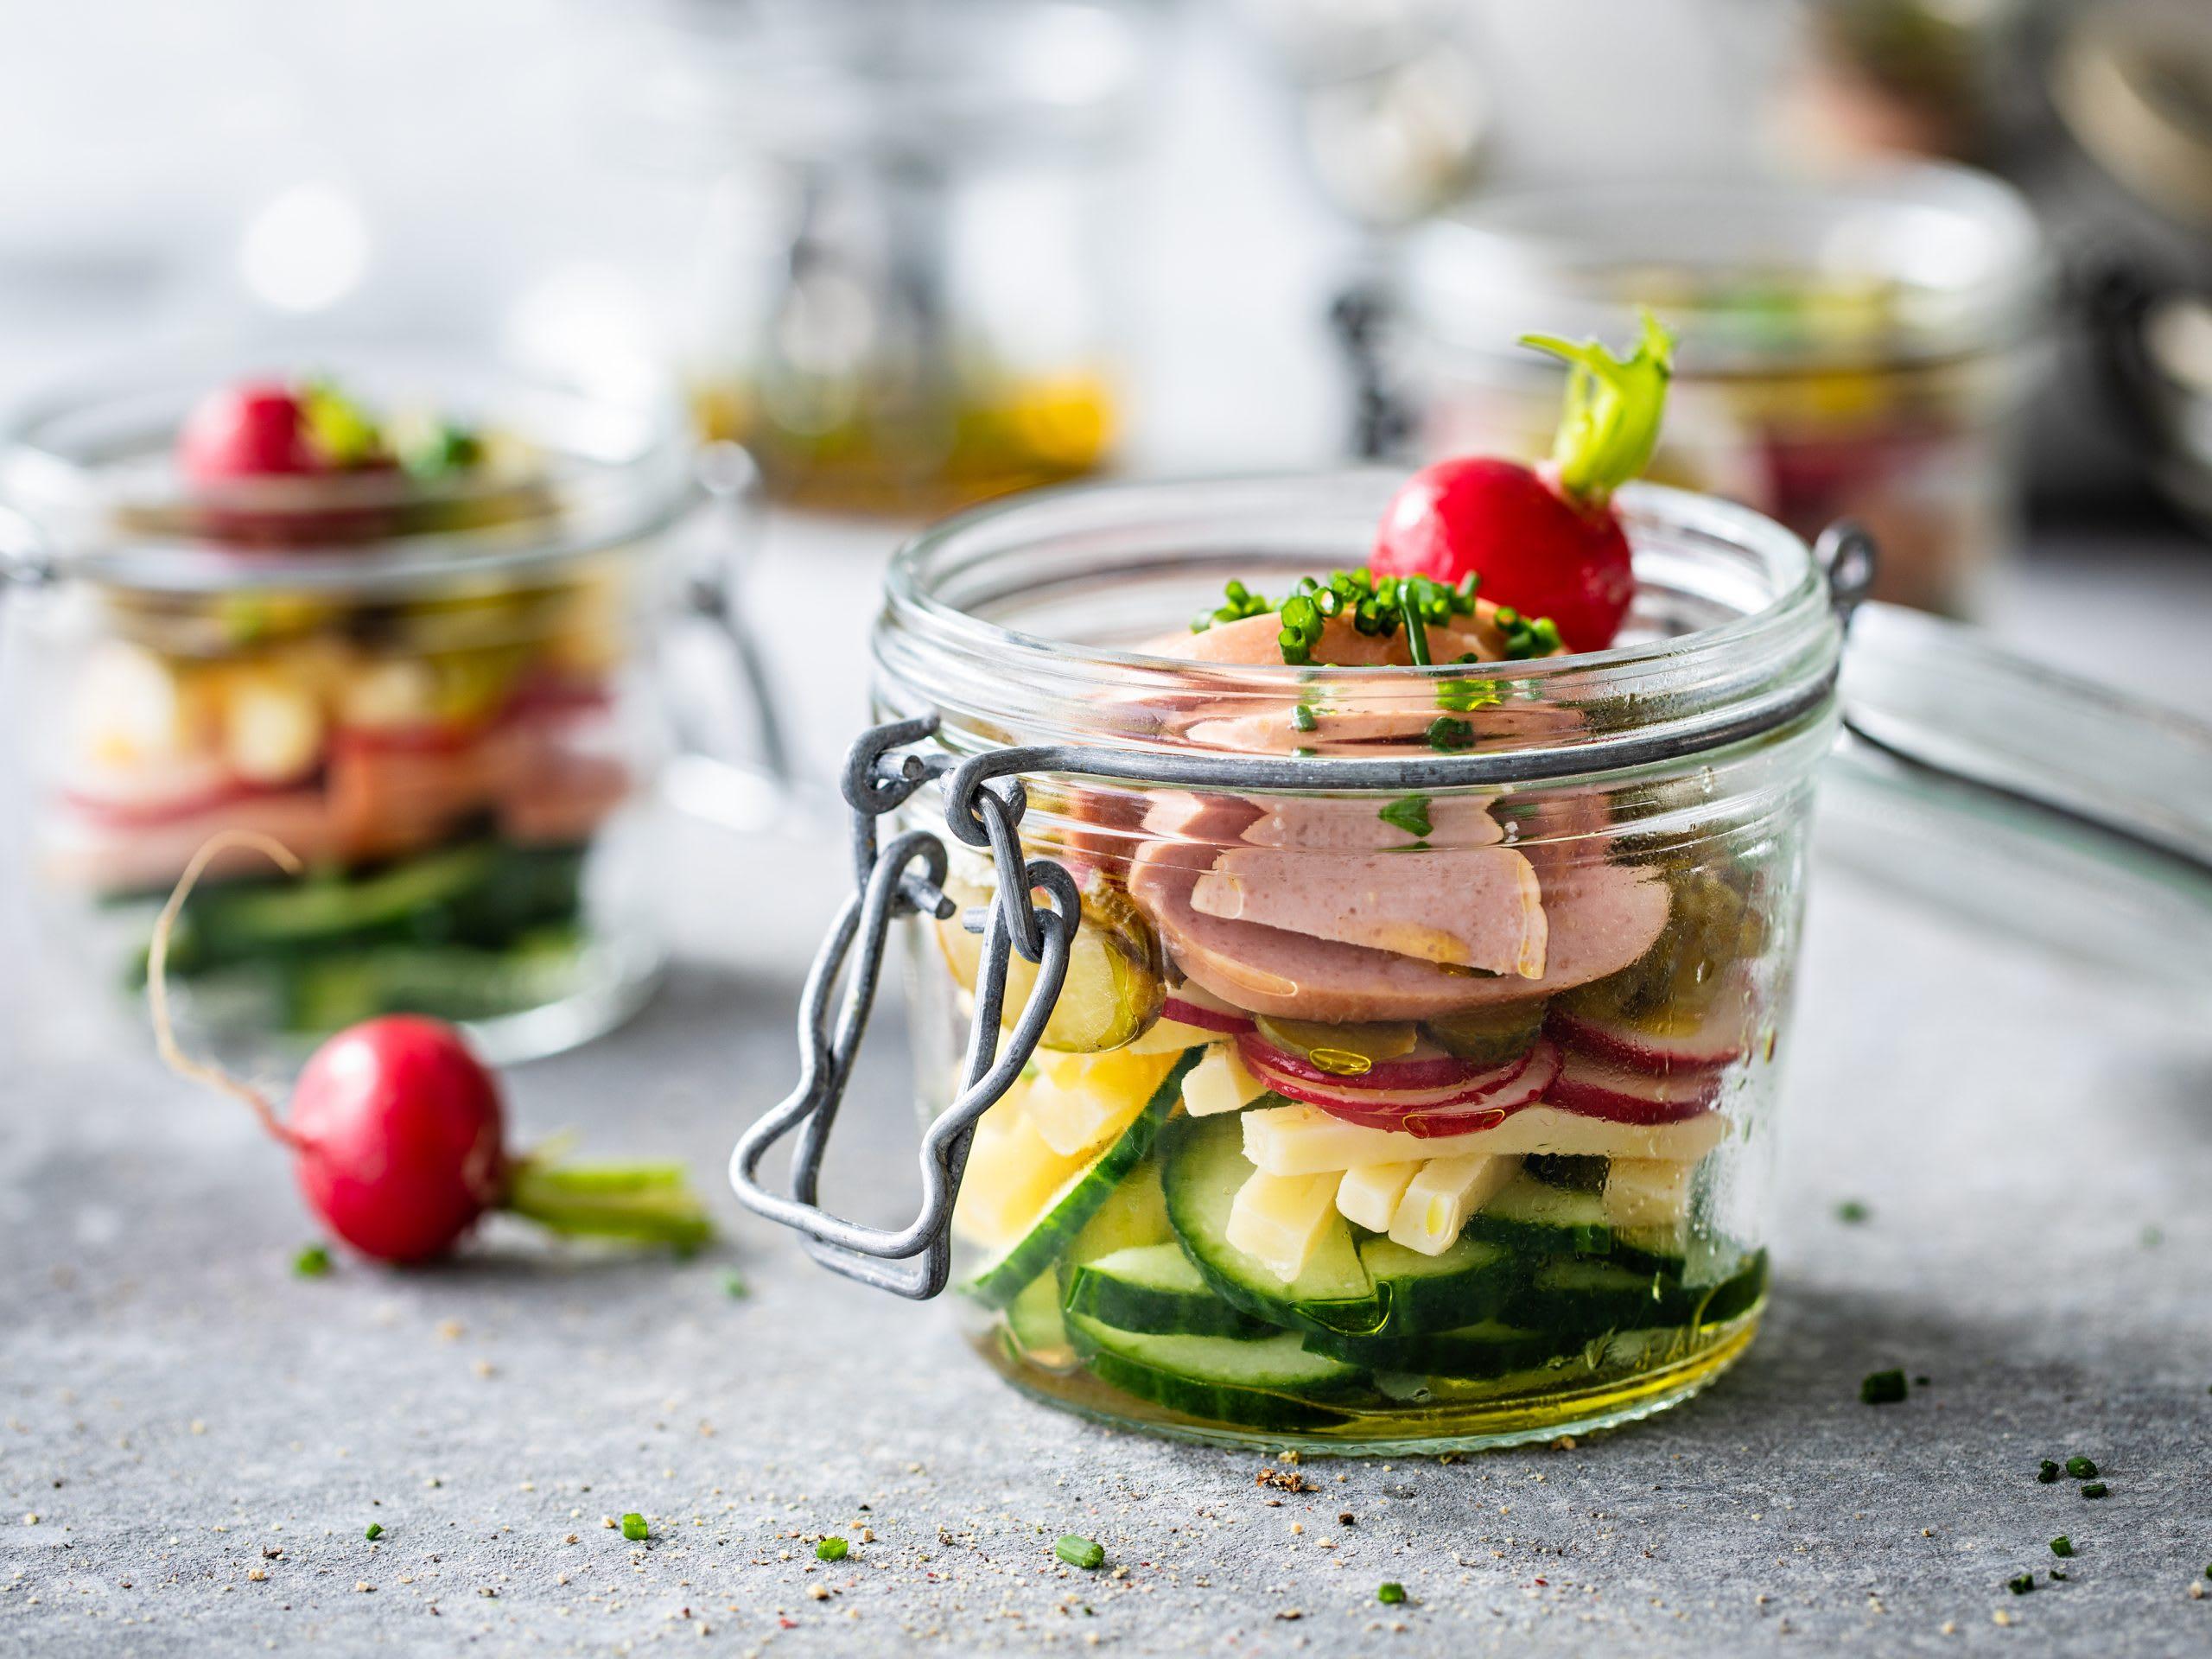 Wurst-Käse-Salat mit Gurken